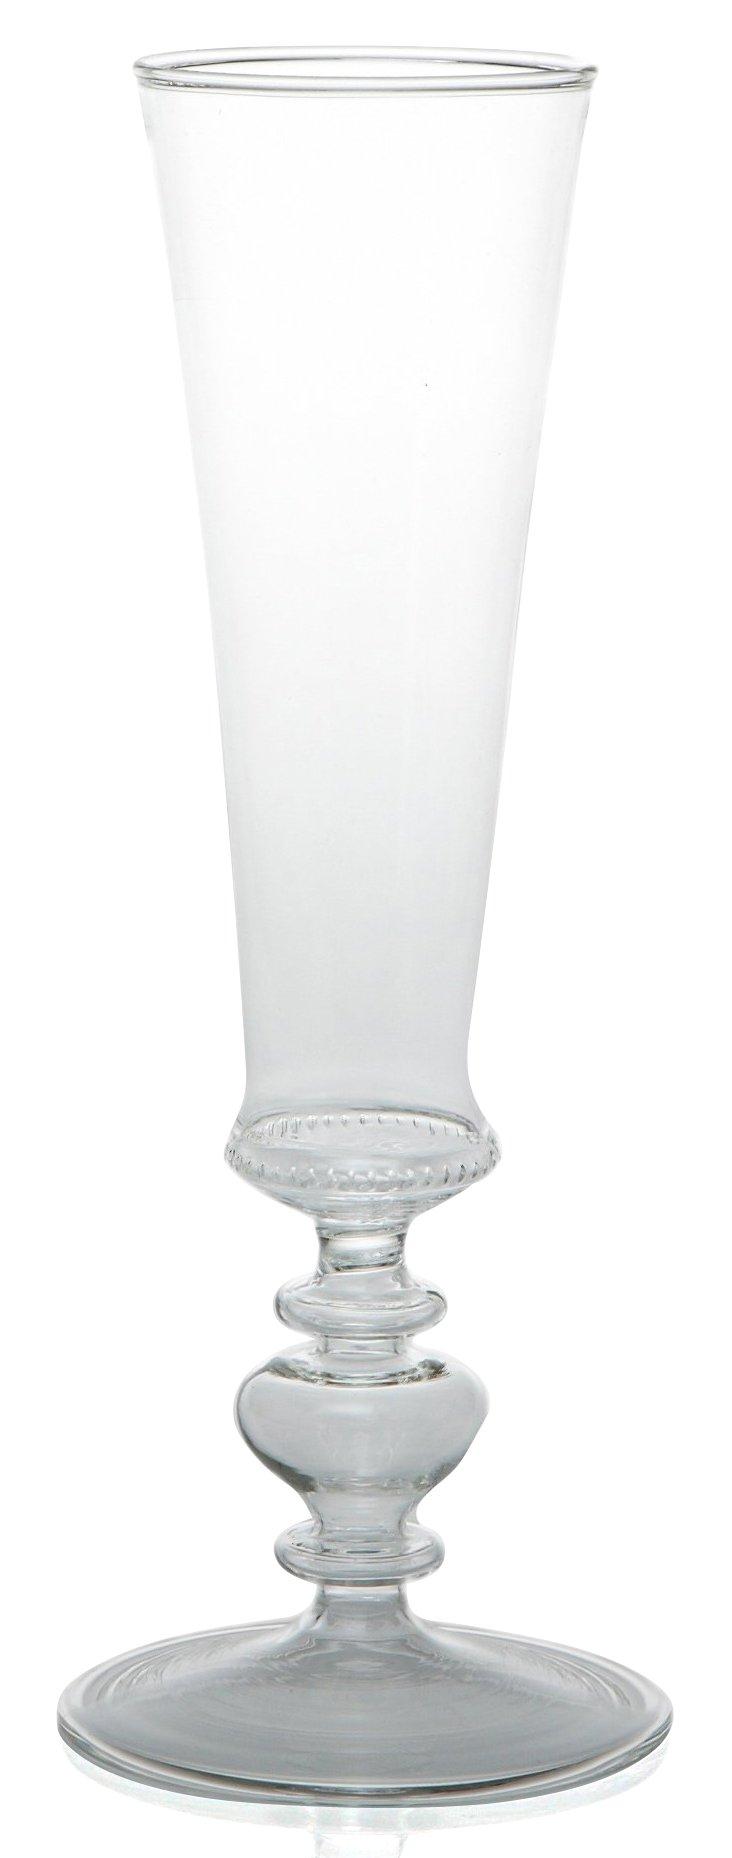 S/4 La Boheme Champagne Flutes